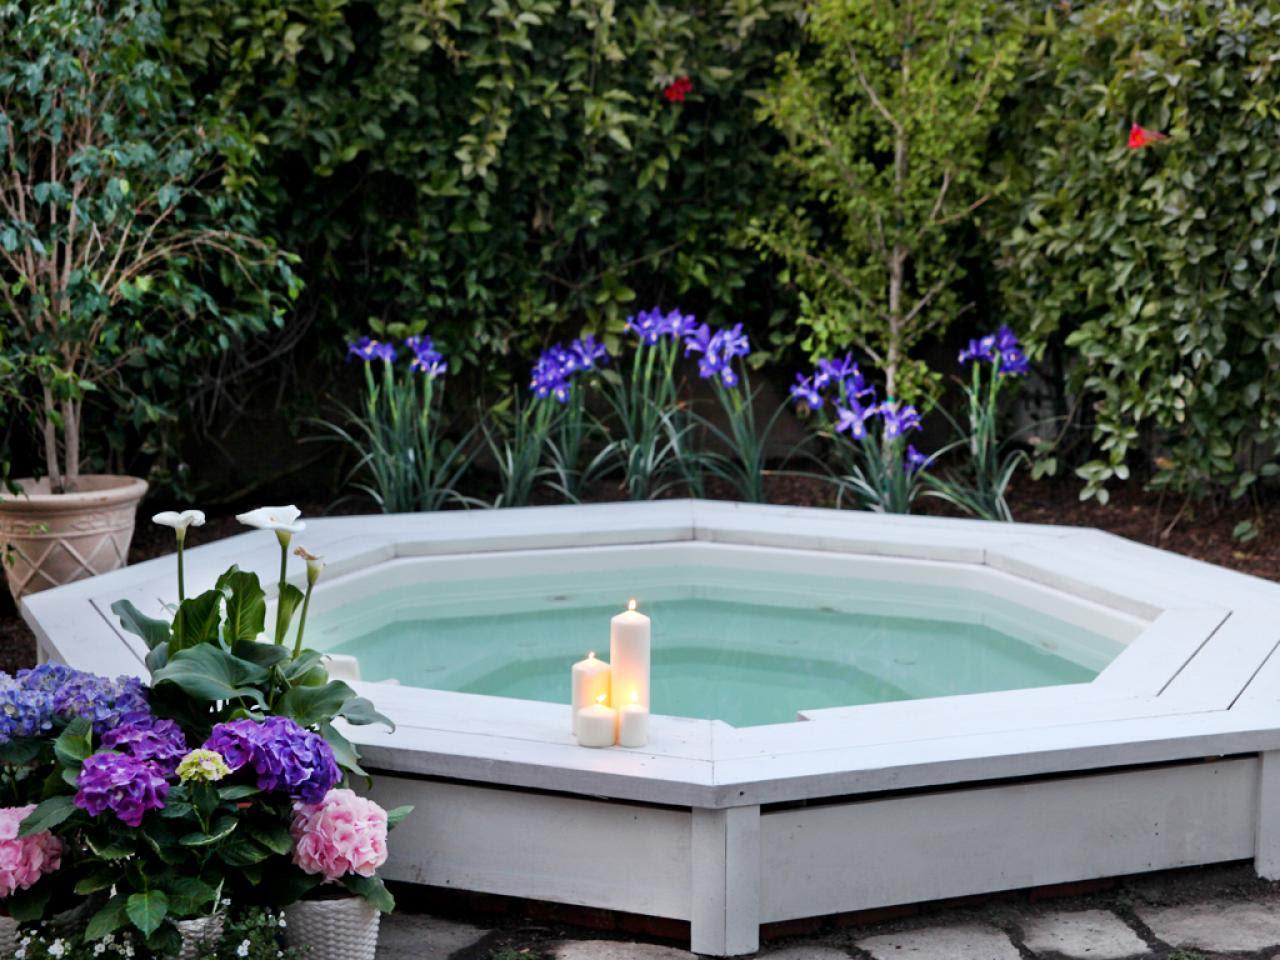 Sexy Hot Tubs and Spas | Outdoor Spaces - Patio Ideas ...